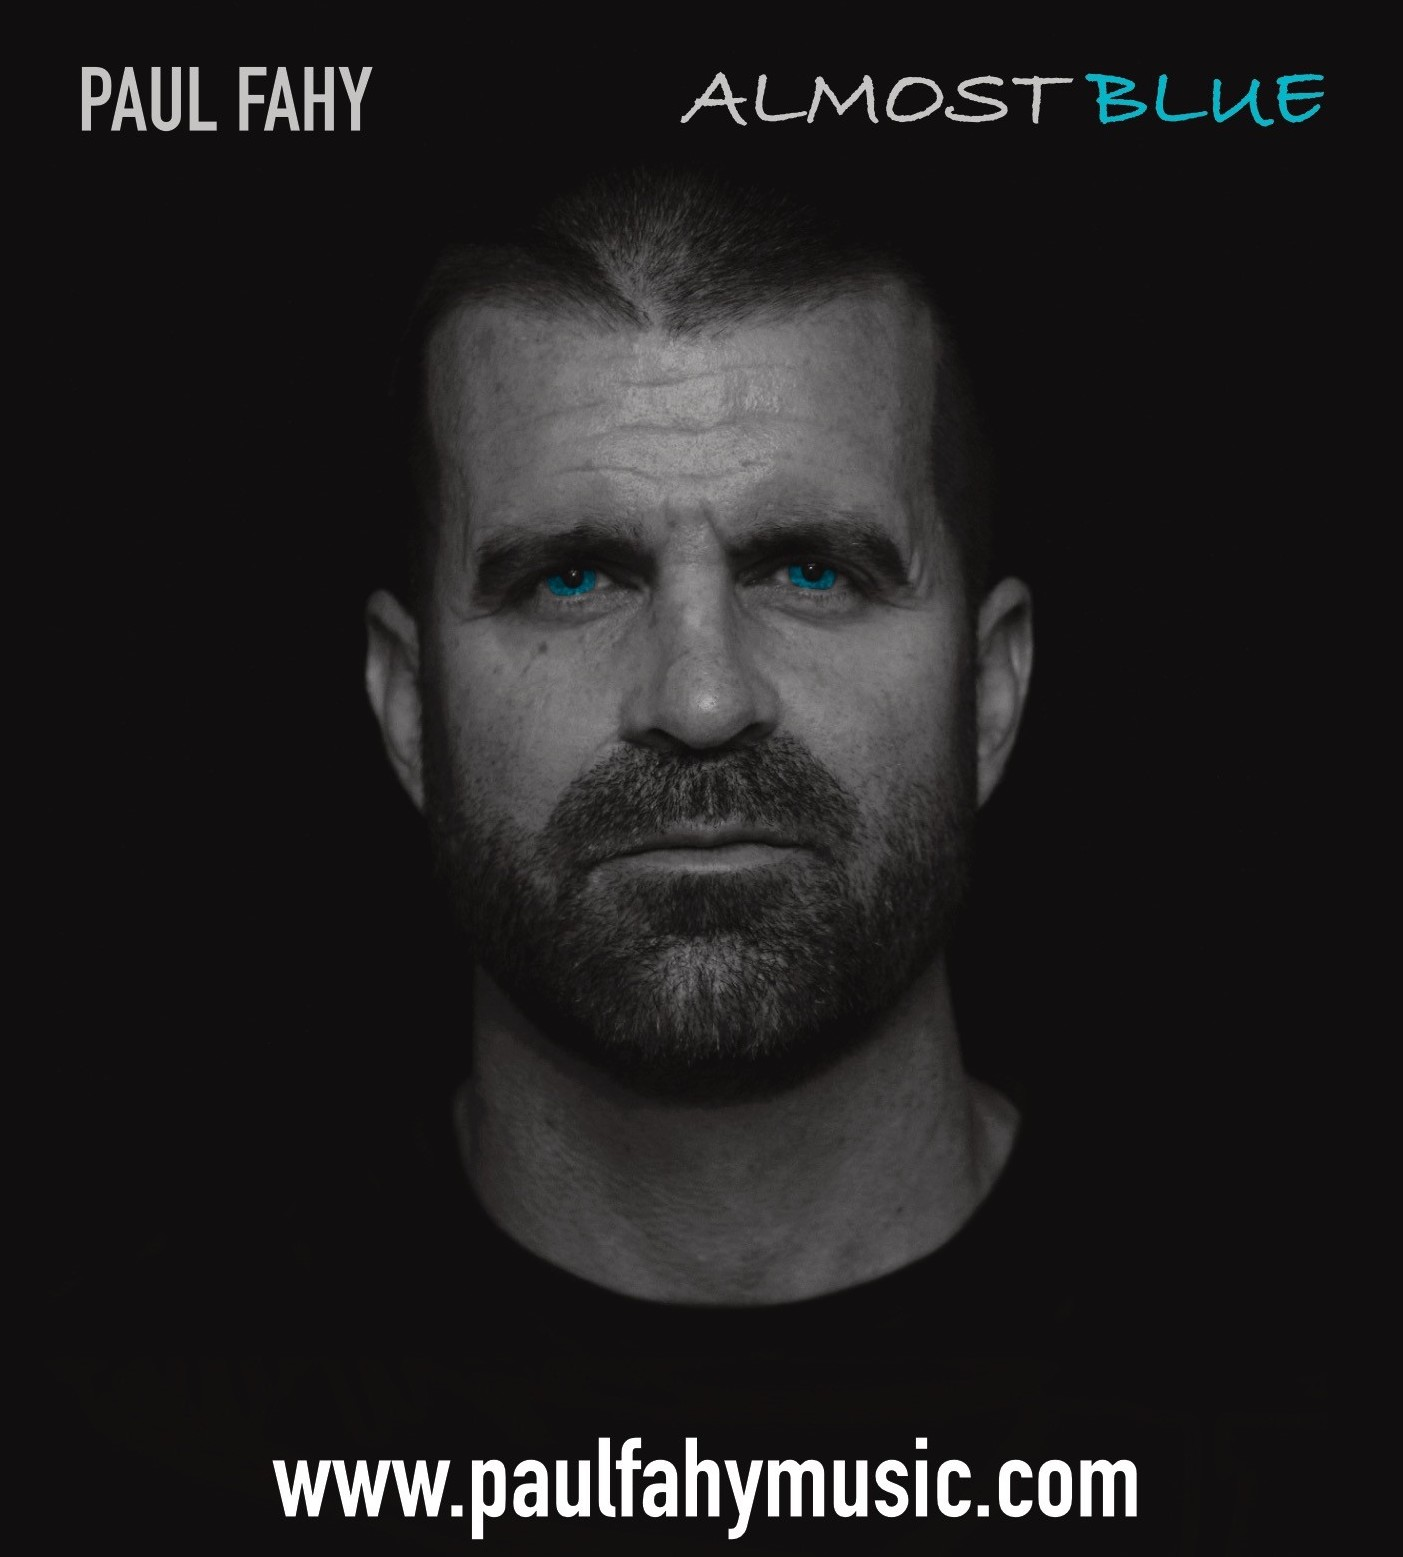 Paul Fahey